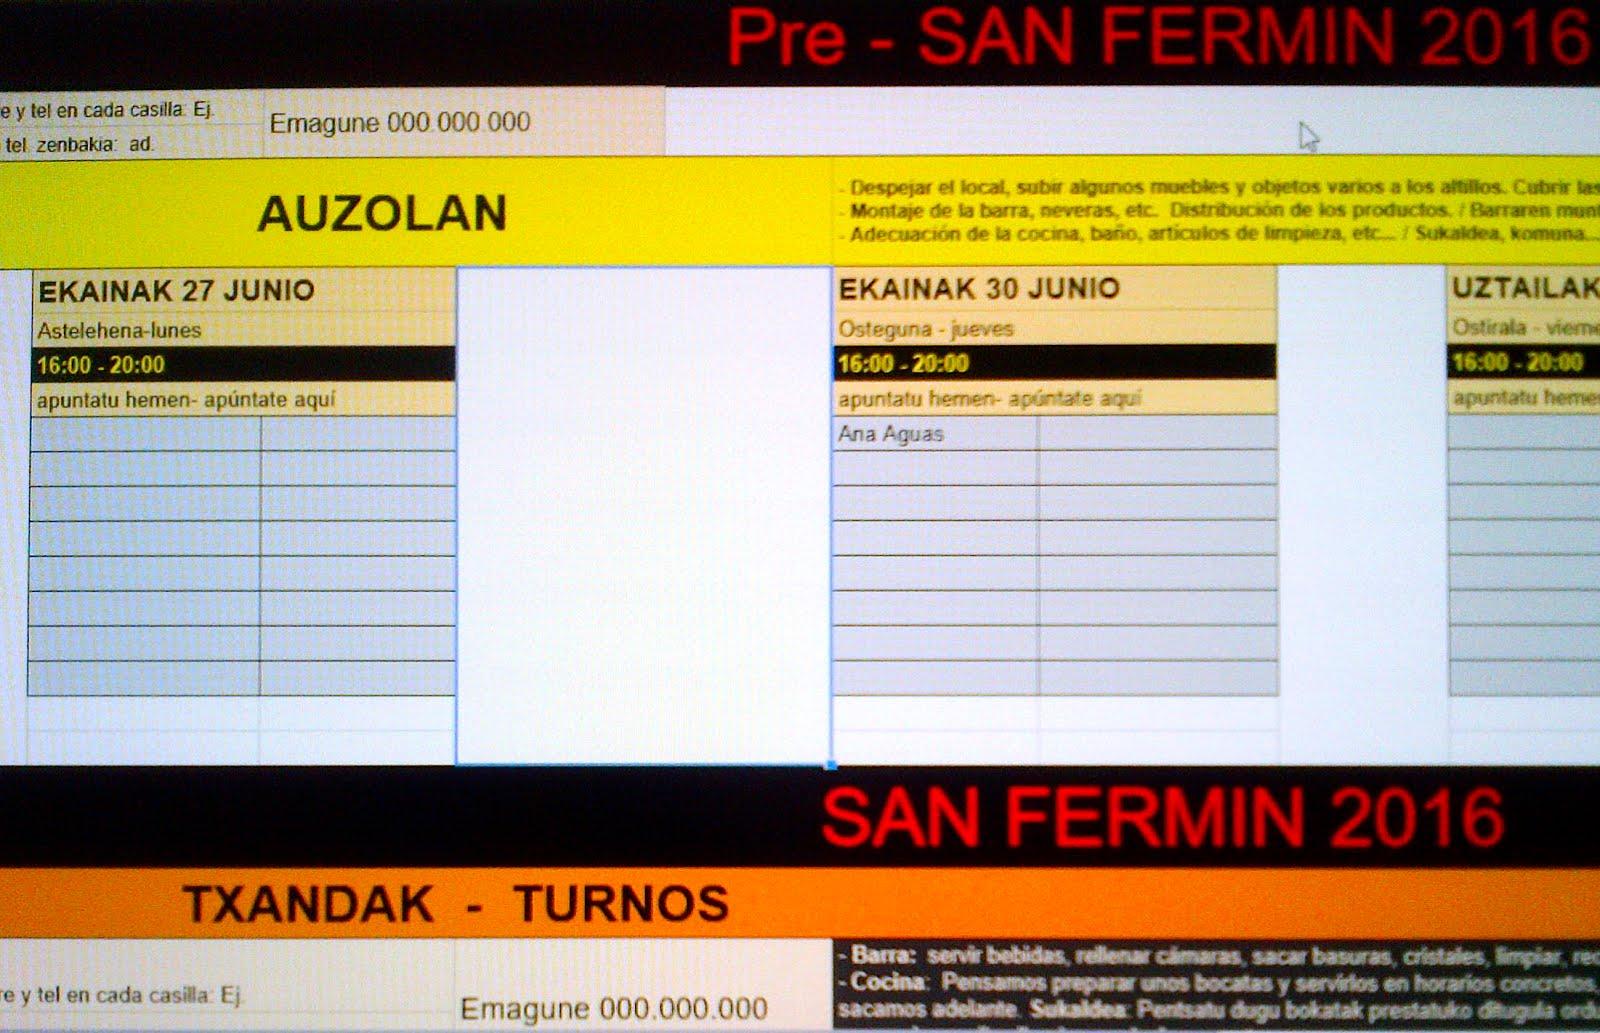 SF 2016 TXANDAK-TURNOS